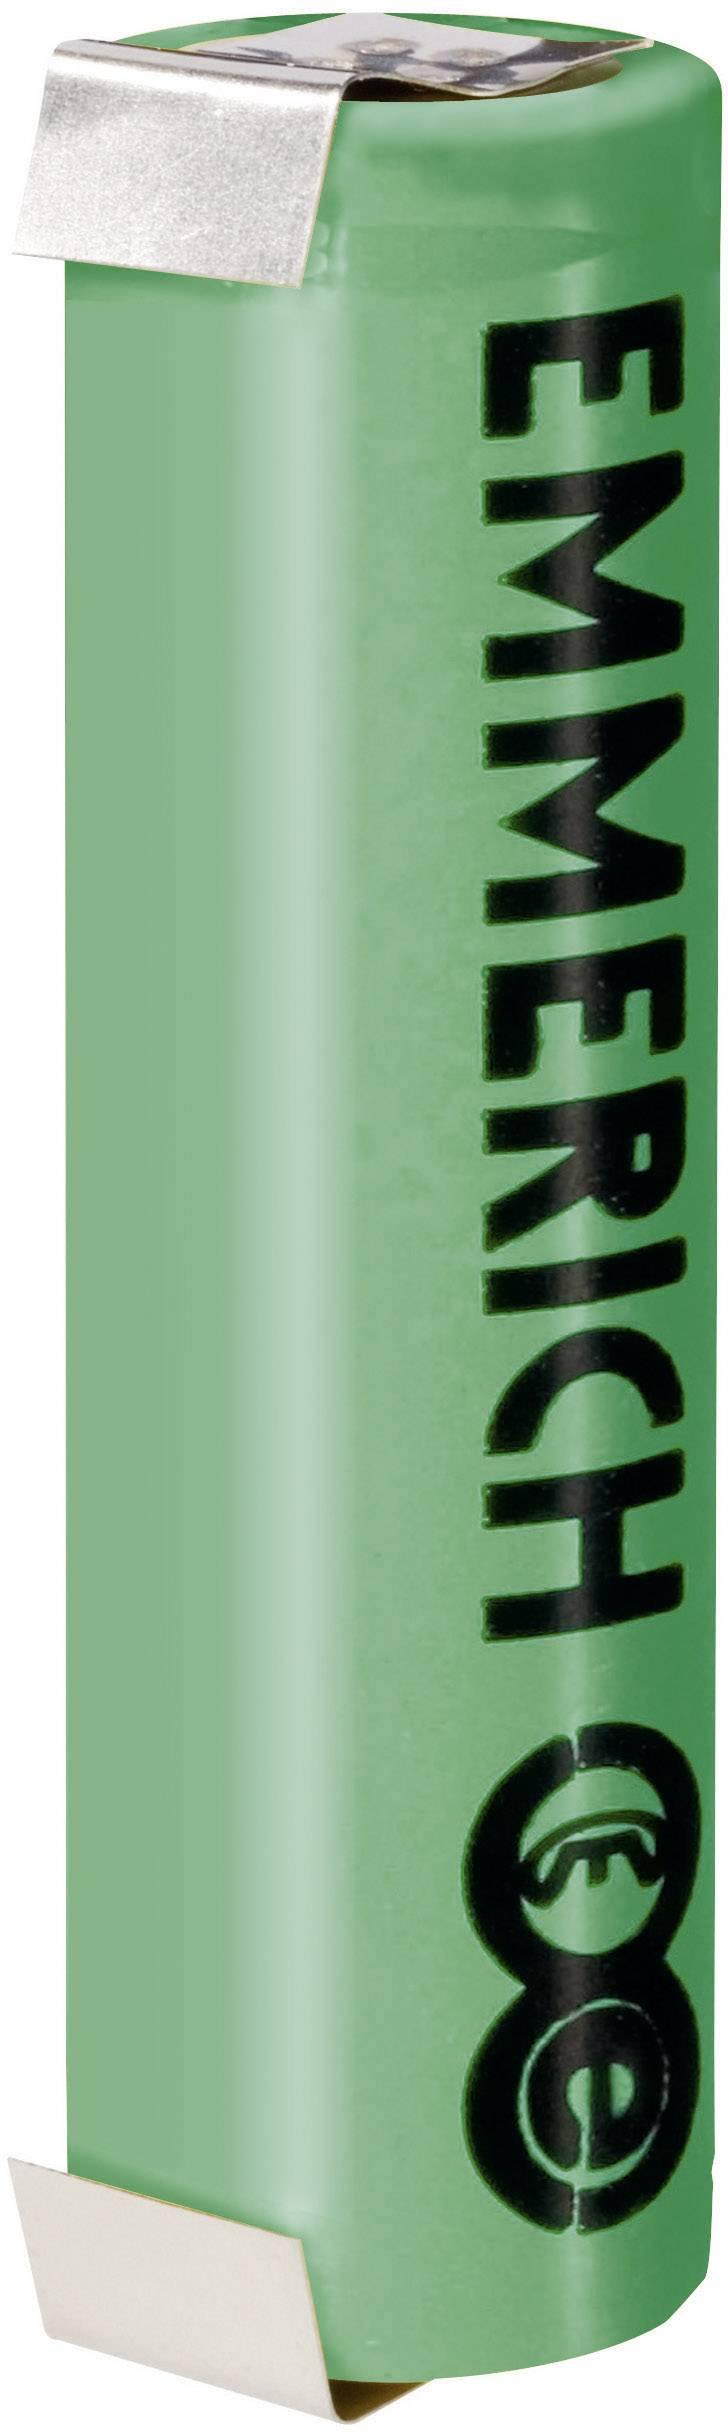 Lítiový nanofosfátový akumulátor ULT 18650 FP